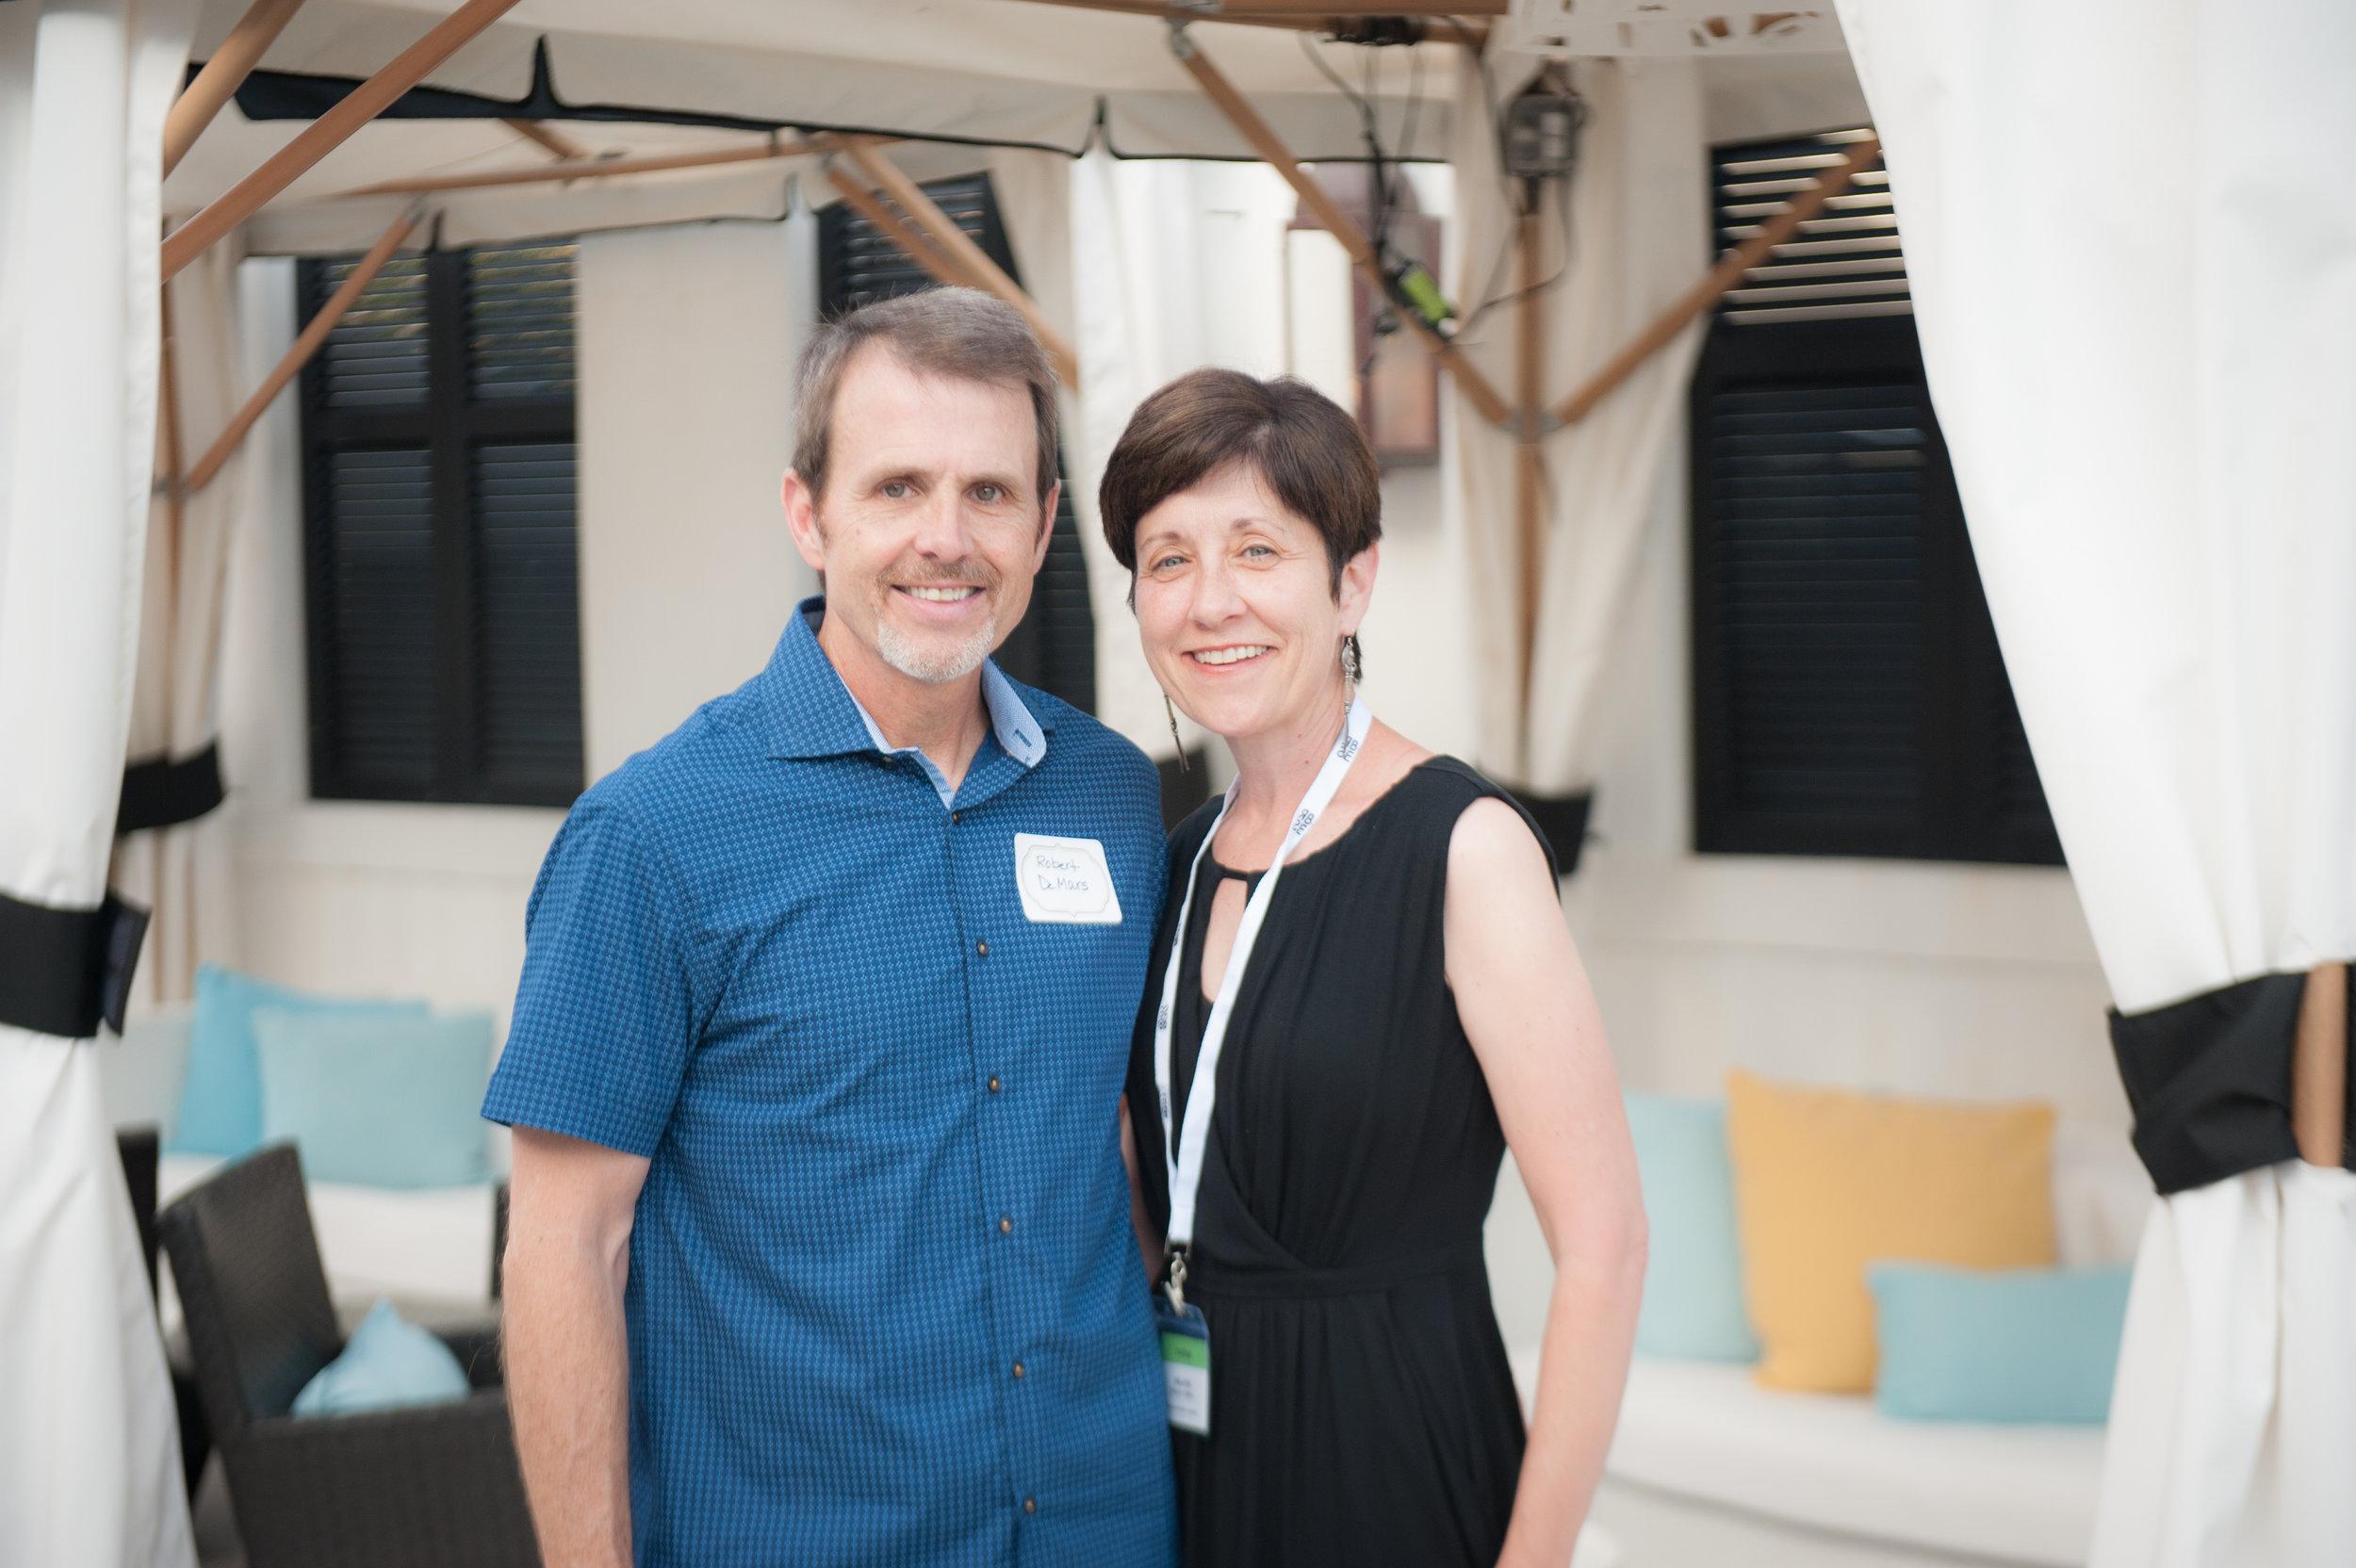 DSC_0042 Malayne & Robert at Patrons Party.jpg